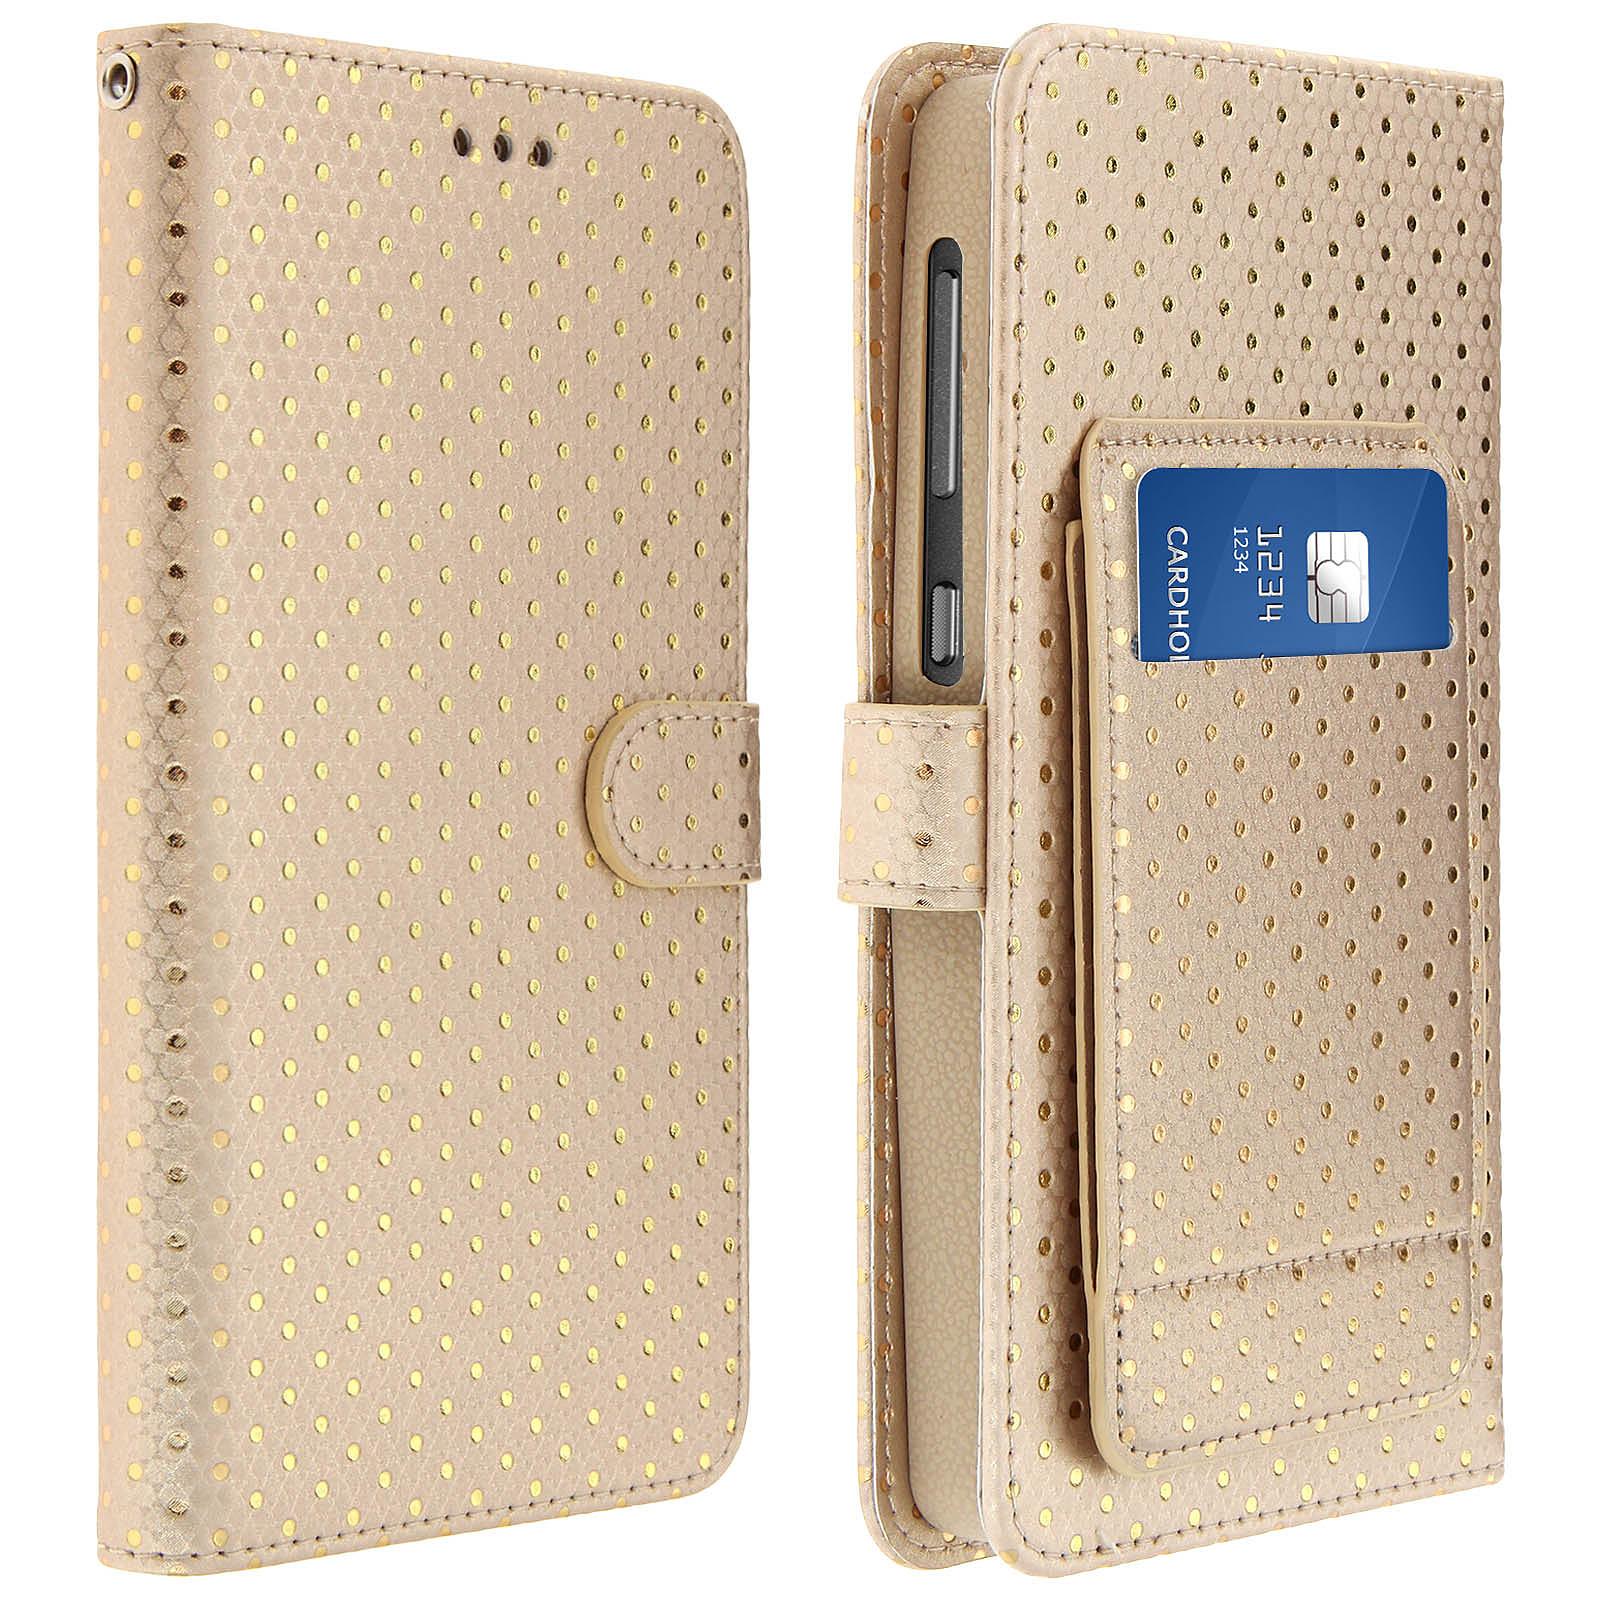 Avizar Etui folio Dorée pour Smartphones de 5.3' à 5.5'